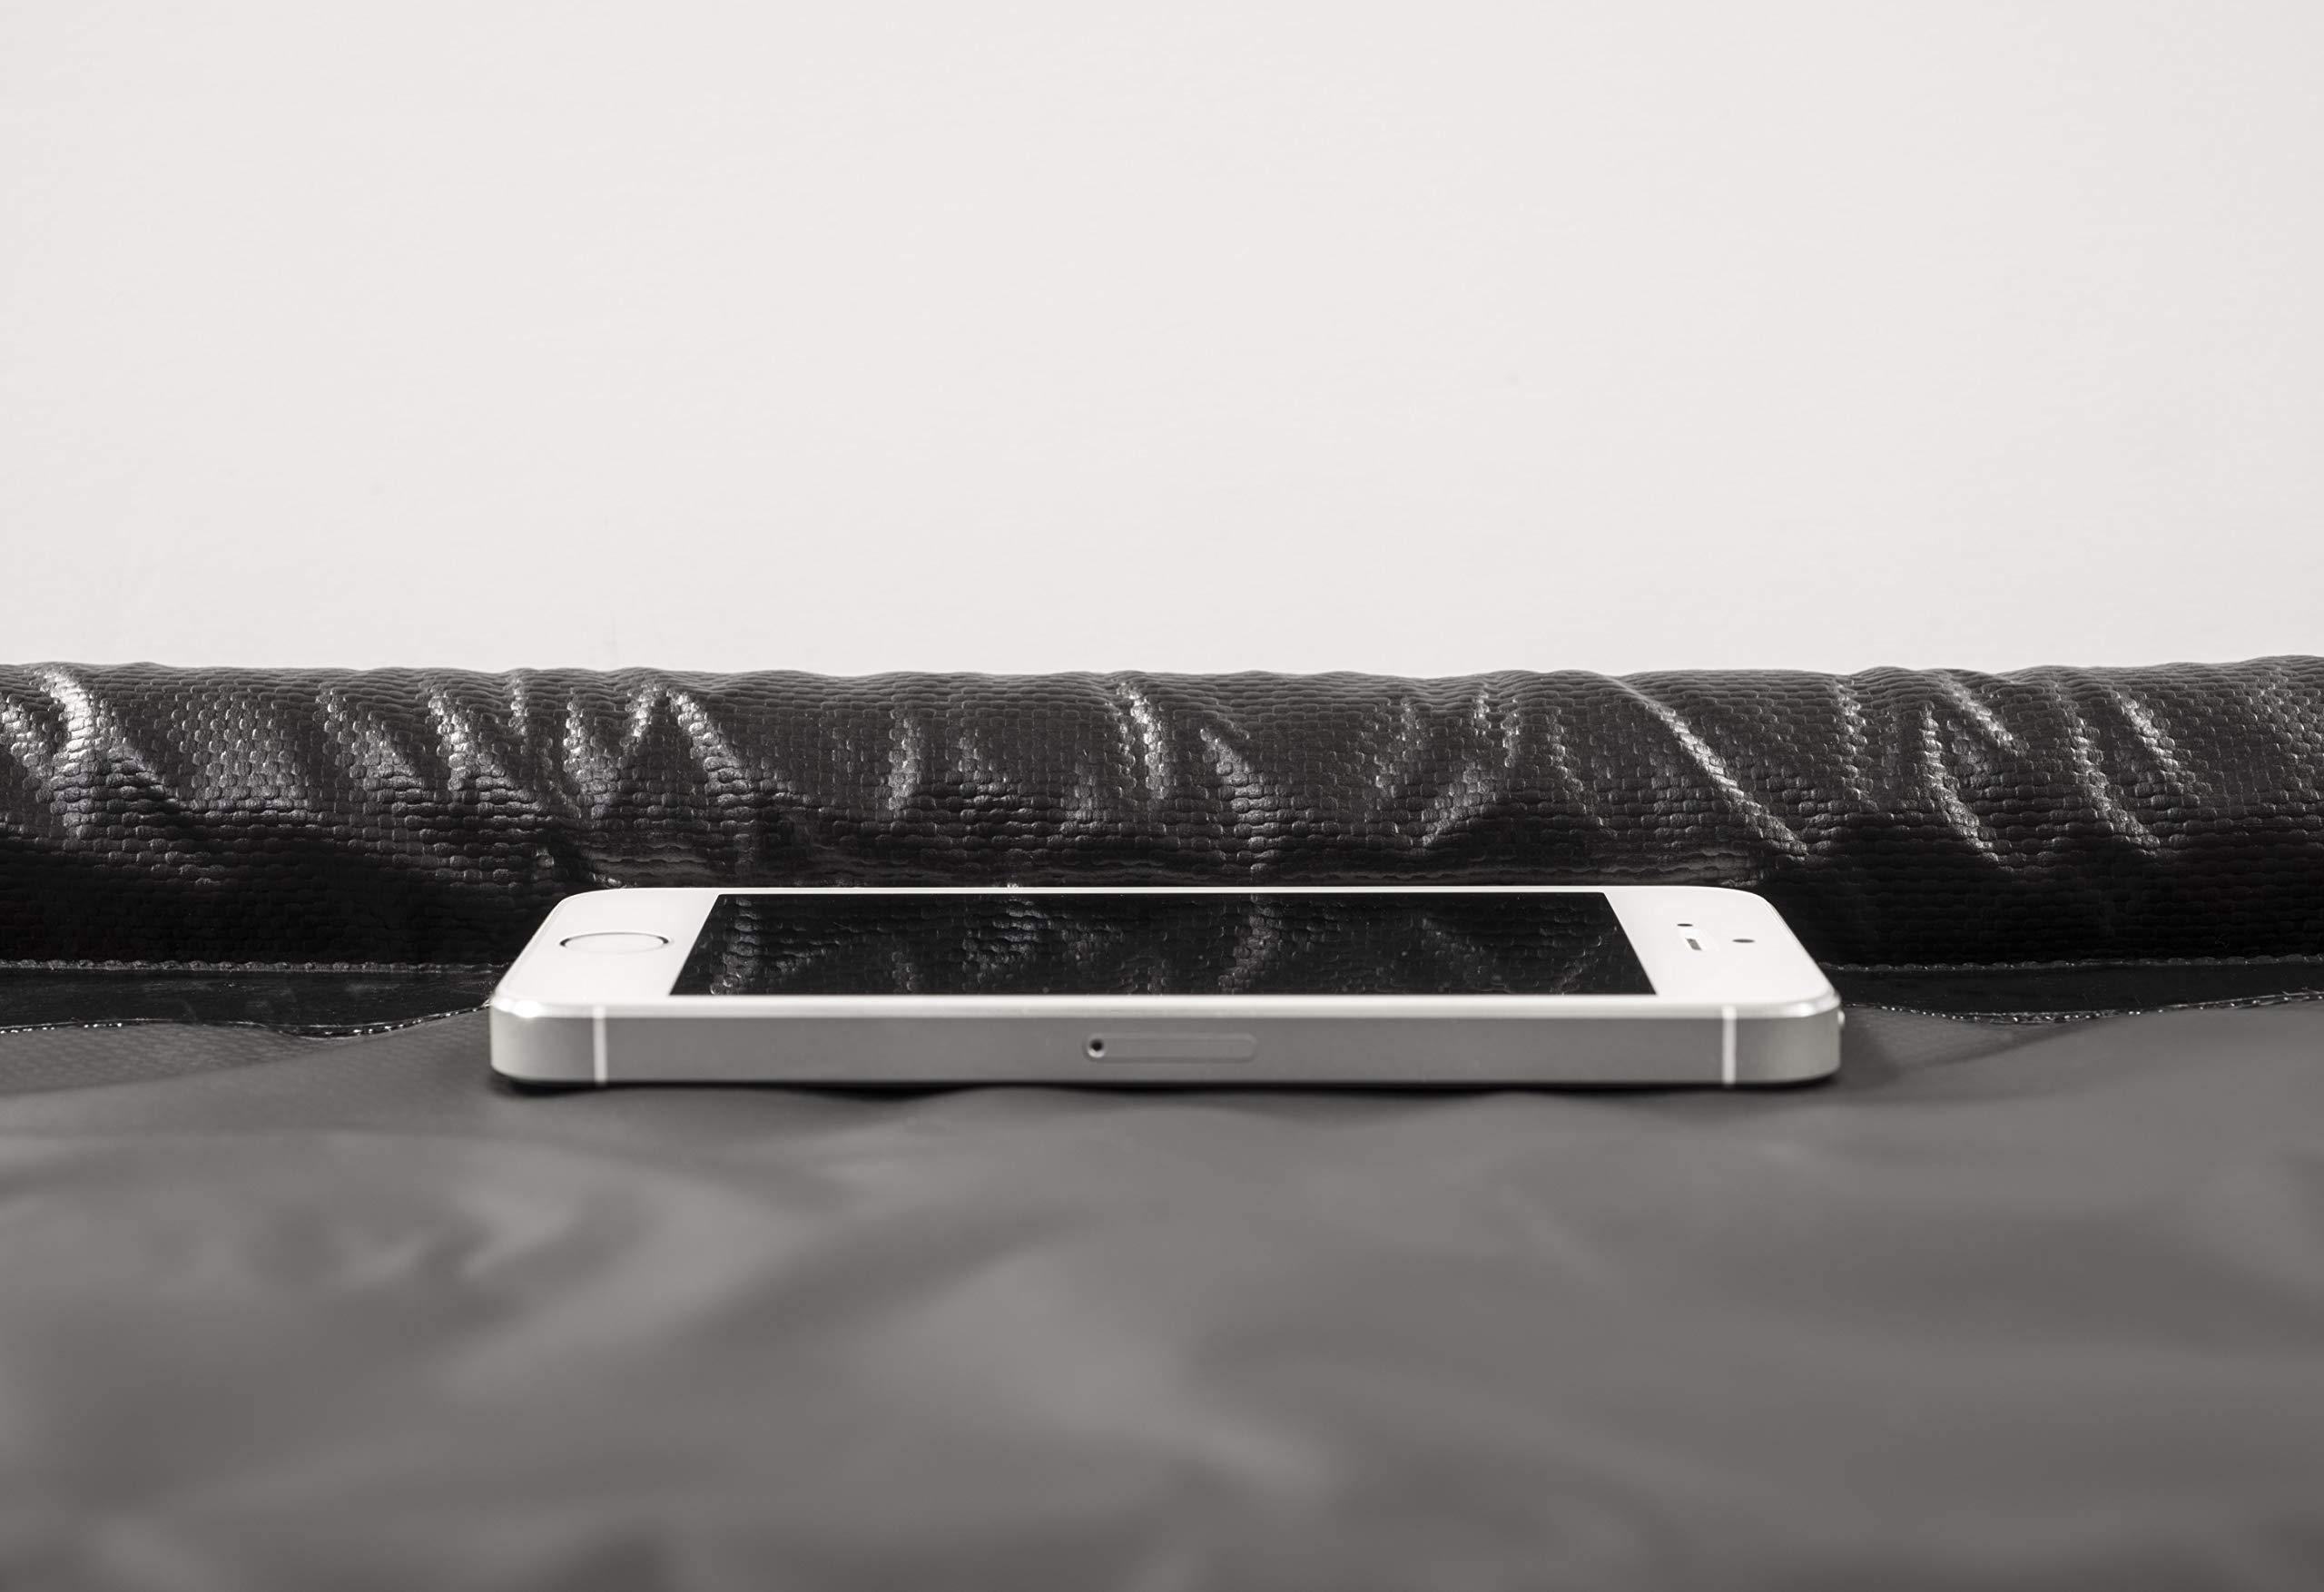 AutoFloorGuard AFGS-7916 Black 7'9'' x 16' AFG Compact Size Containment mat by AutoFloorGuard (Image #4)